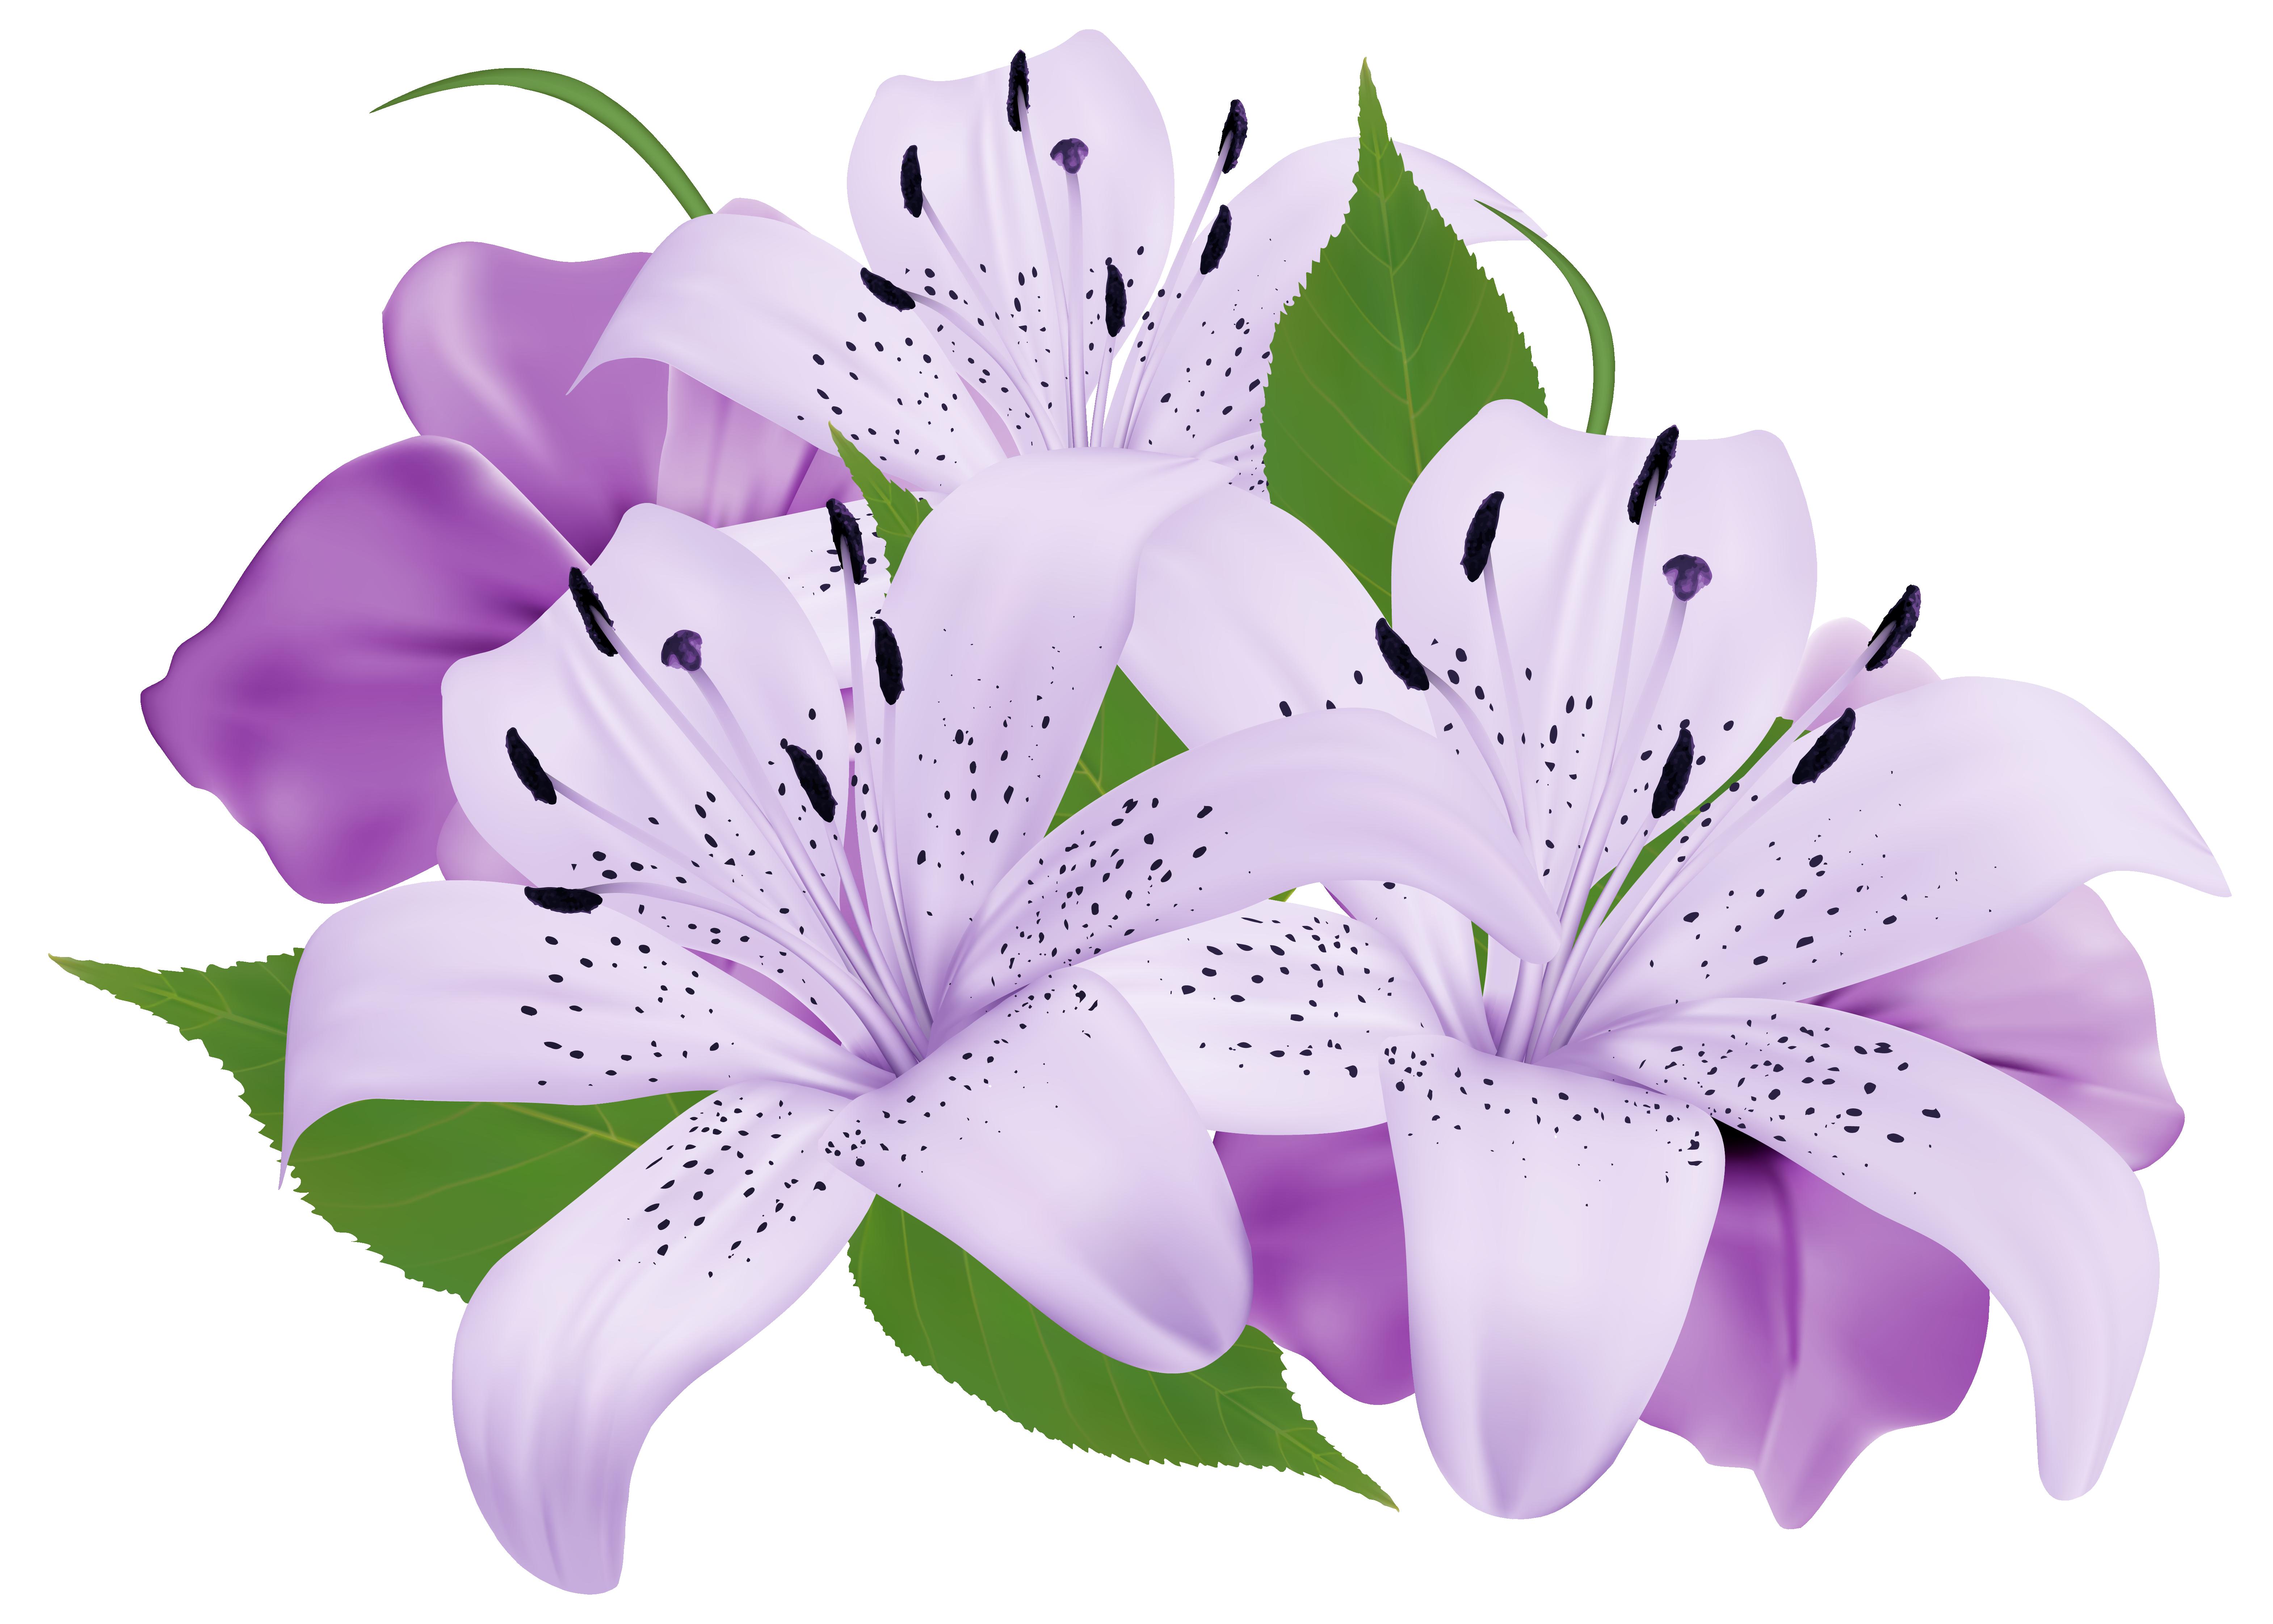 Lily clipart flower bokeh, Lily flower bokeh Transparent ...